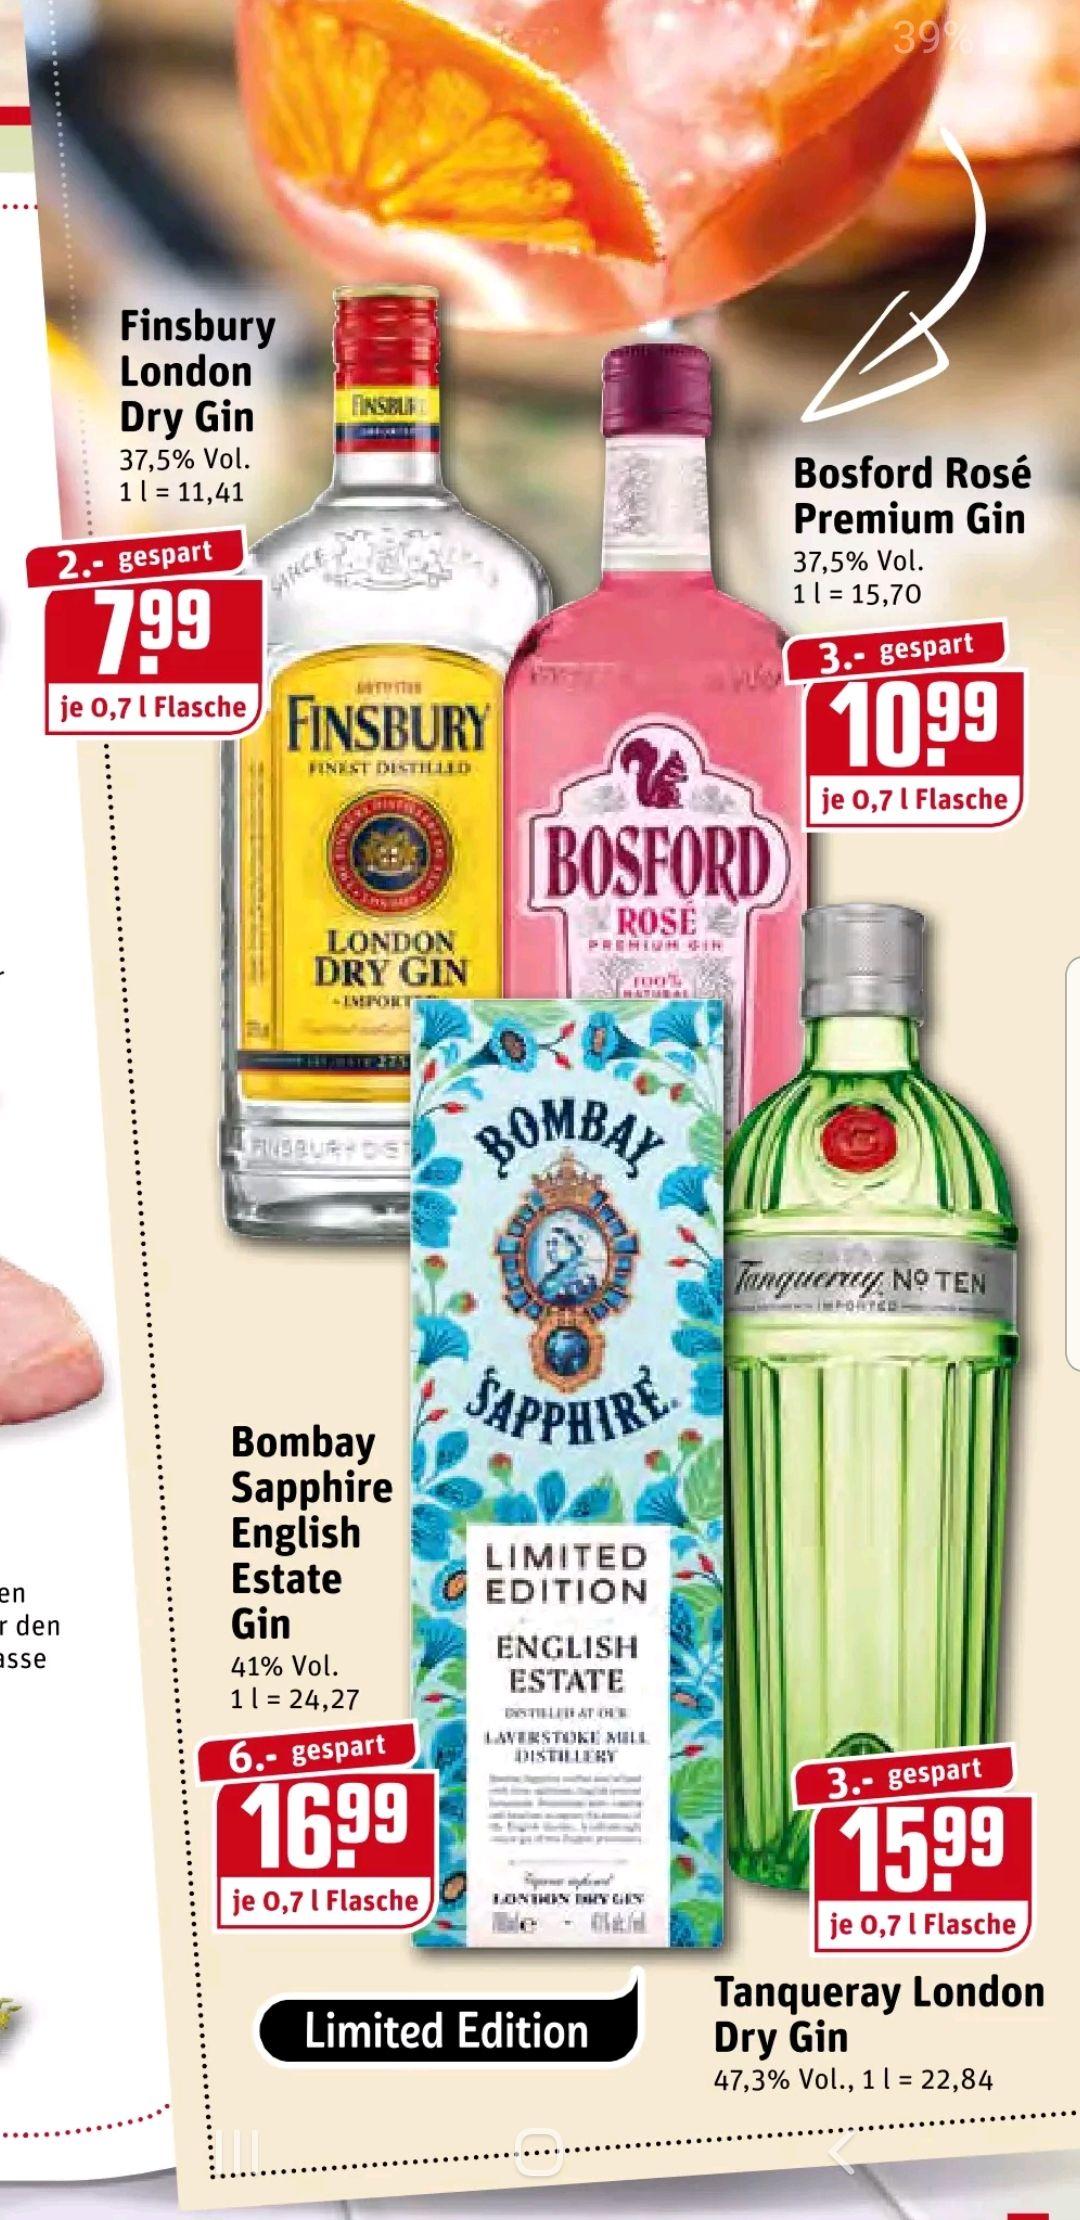 [Lokal] Rewe Dortmund - Bombay Sapphire English Estate Limited Gin